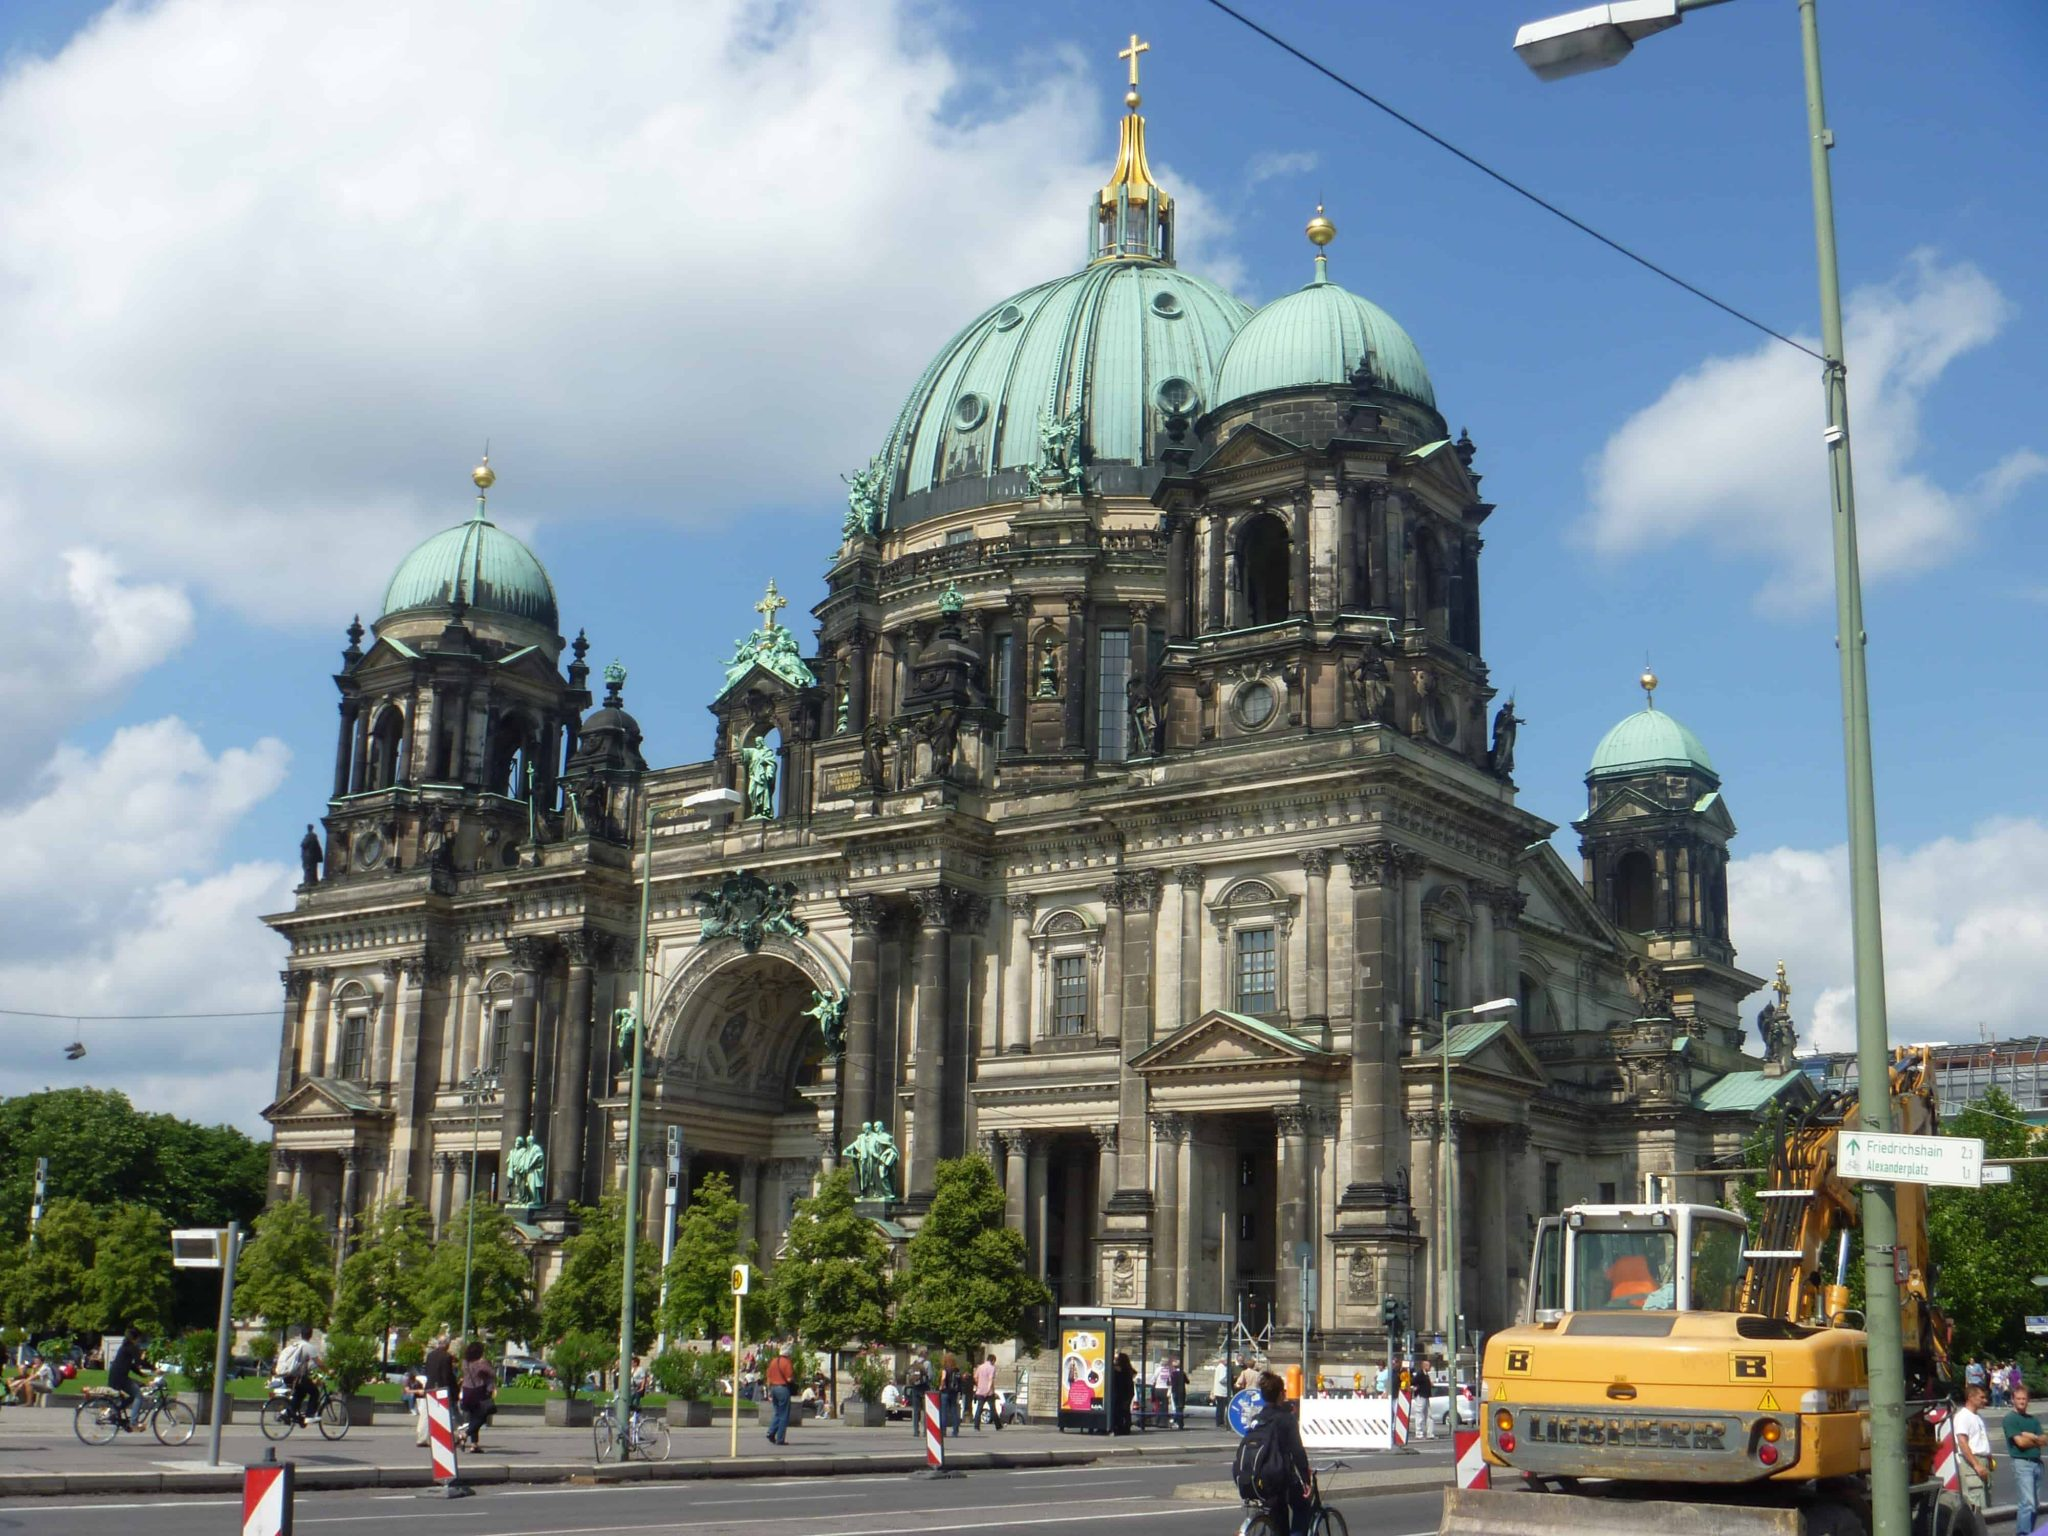 Igreja de referência em Berlim